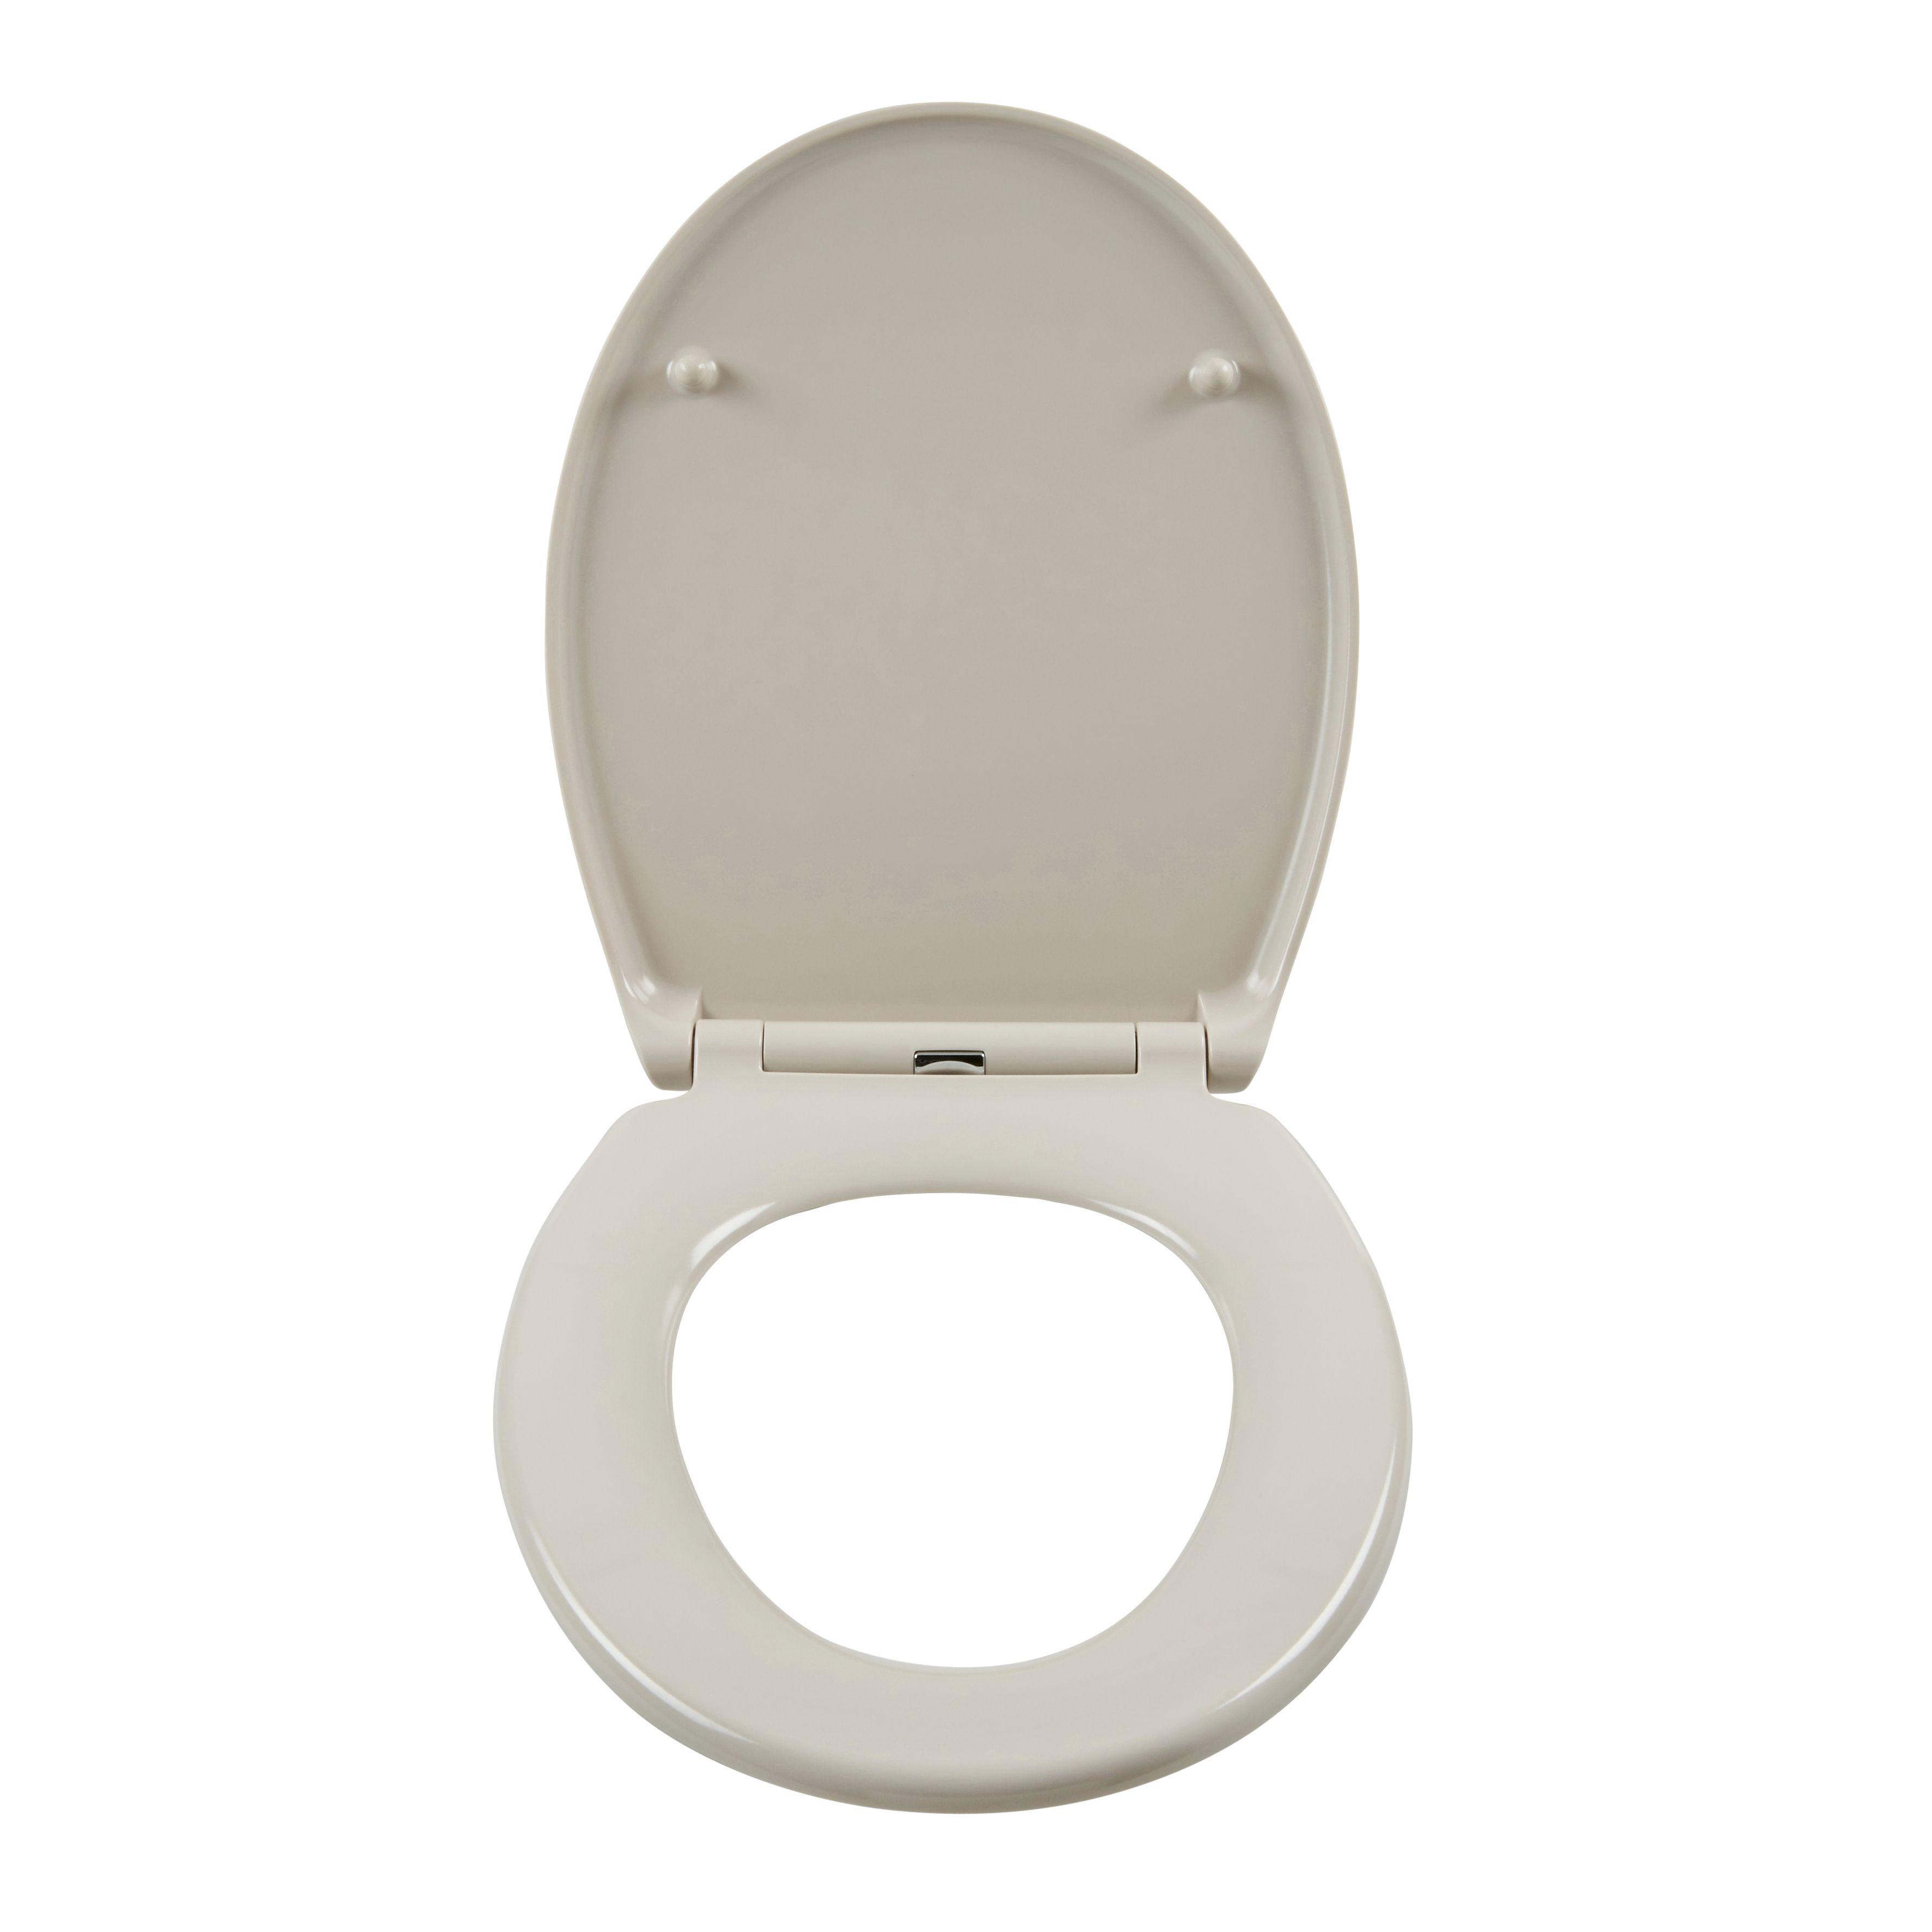 Cooke Lewis Diani Cream Top Fix Soft Close Toilet Seat